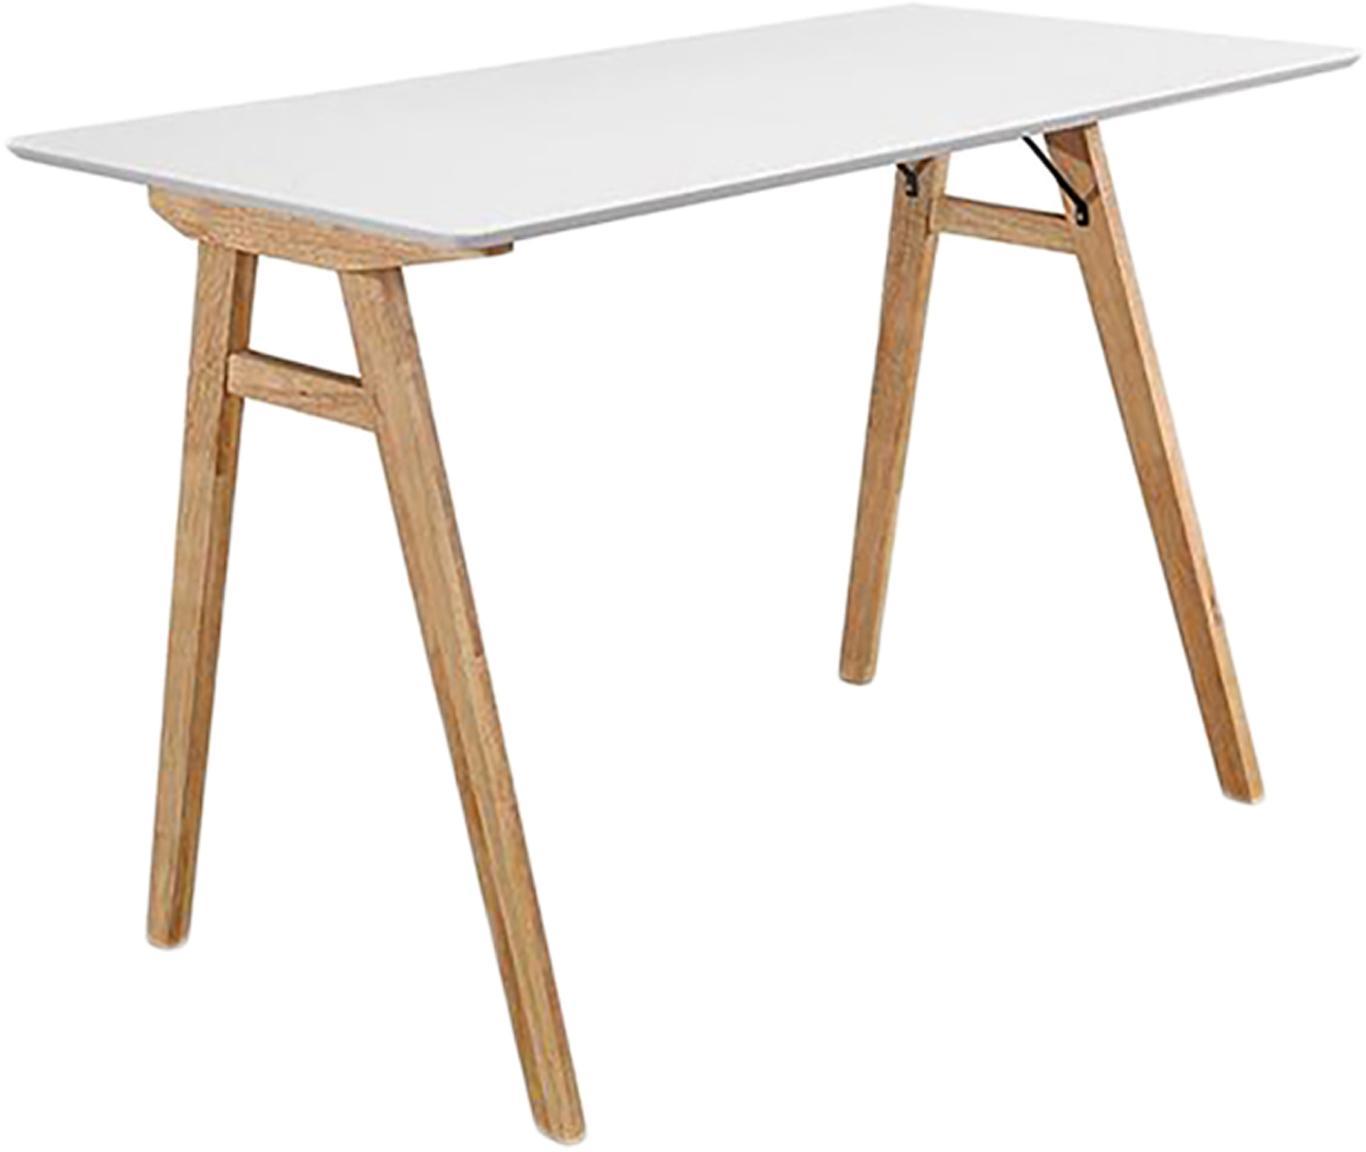 Bureau Vojens met wit tafelblad, Tafelblad: gelakt MDF, Poten: rubberhout, Wit, bruin, B 120 x D 60 cm